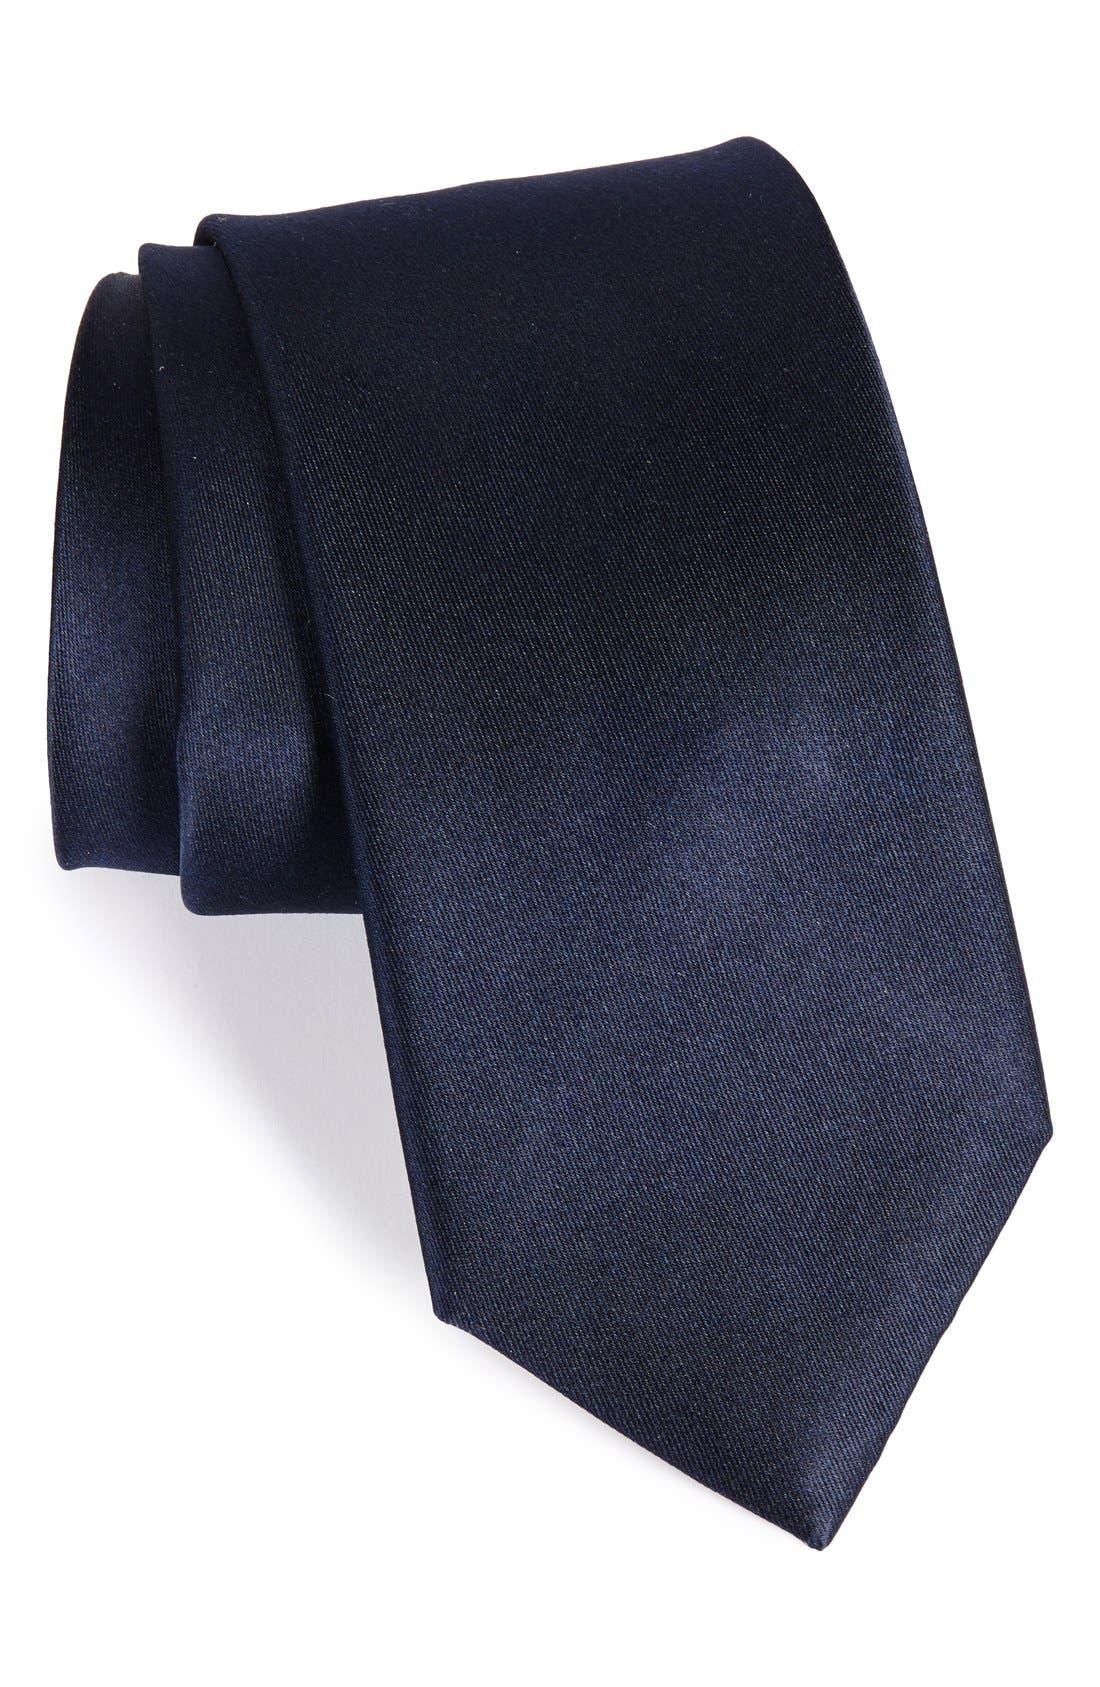 Alternate Image 1 Selected - Nordstrom Men's Shop Solid Satin Silk Tie